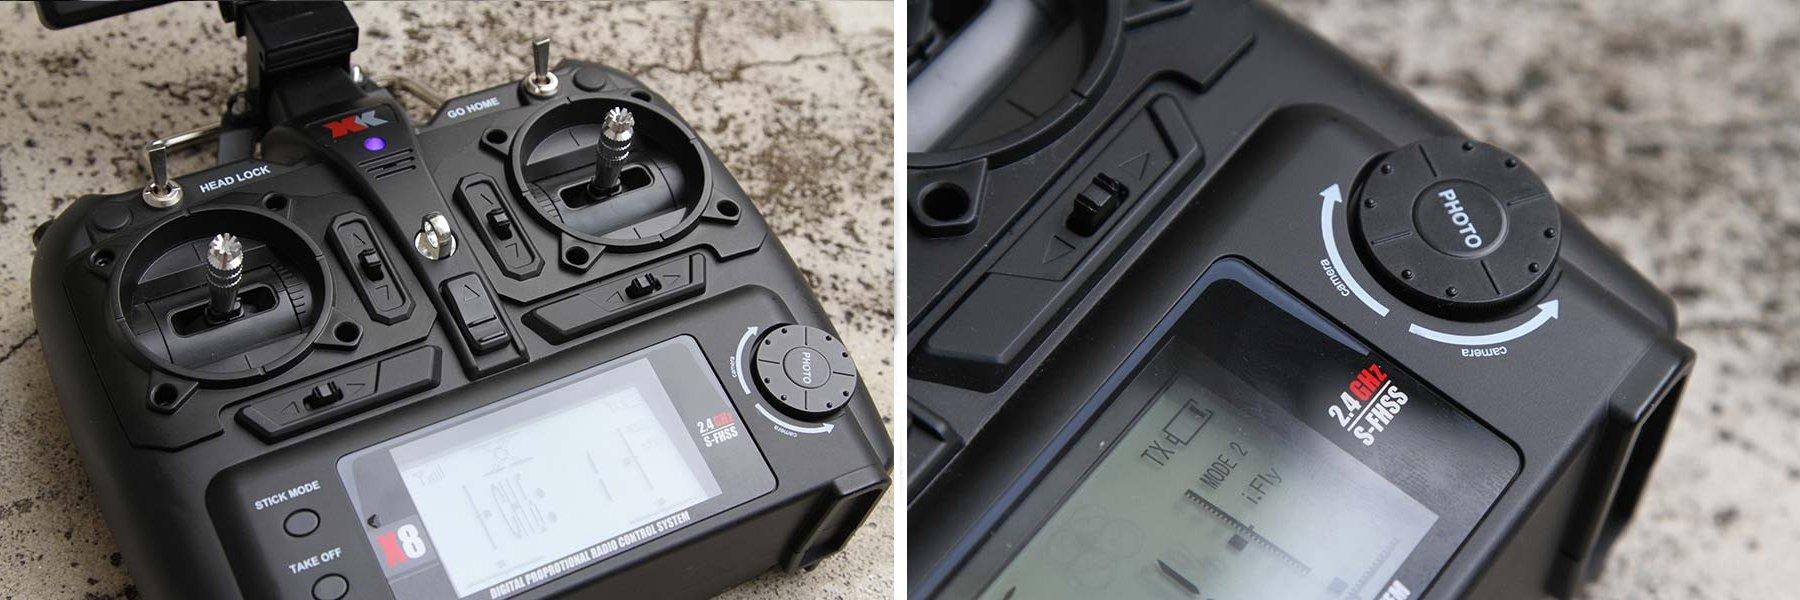 XK Detect X380 - Radiocomando